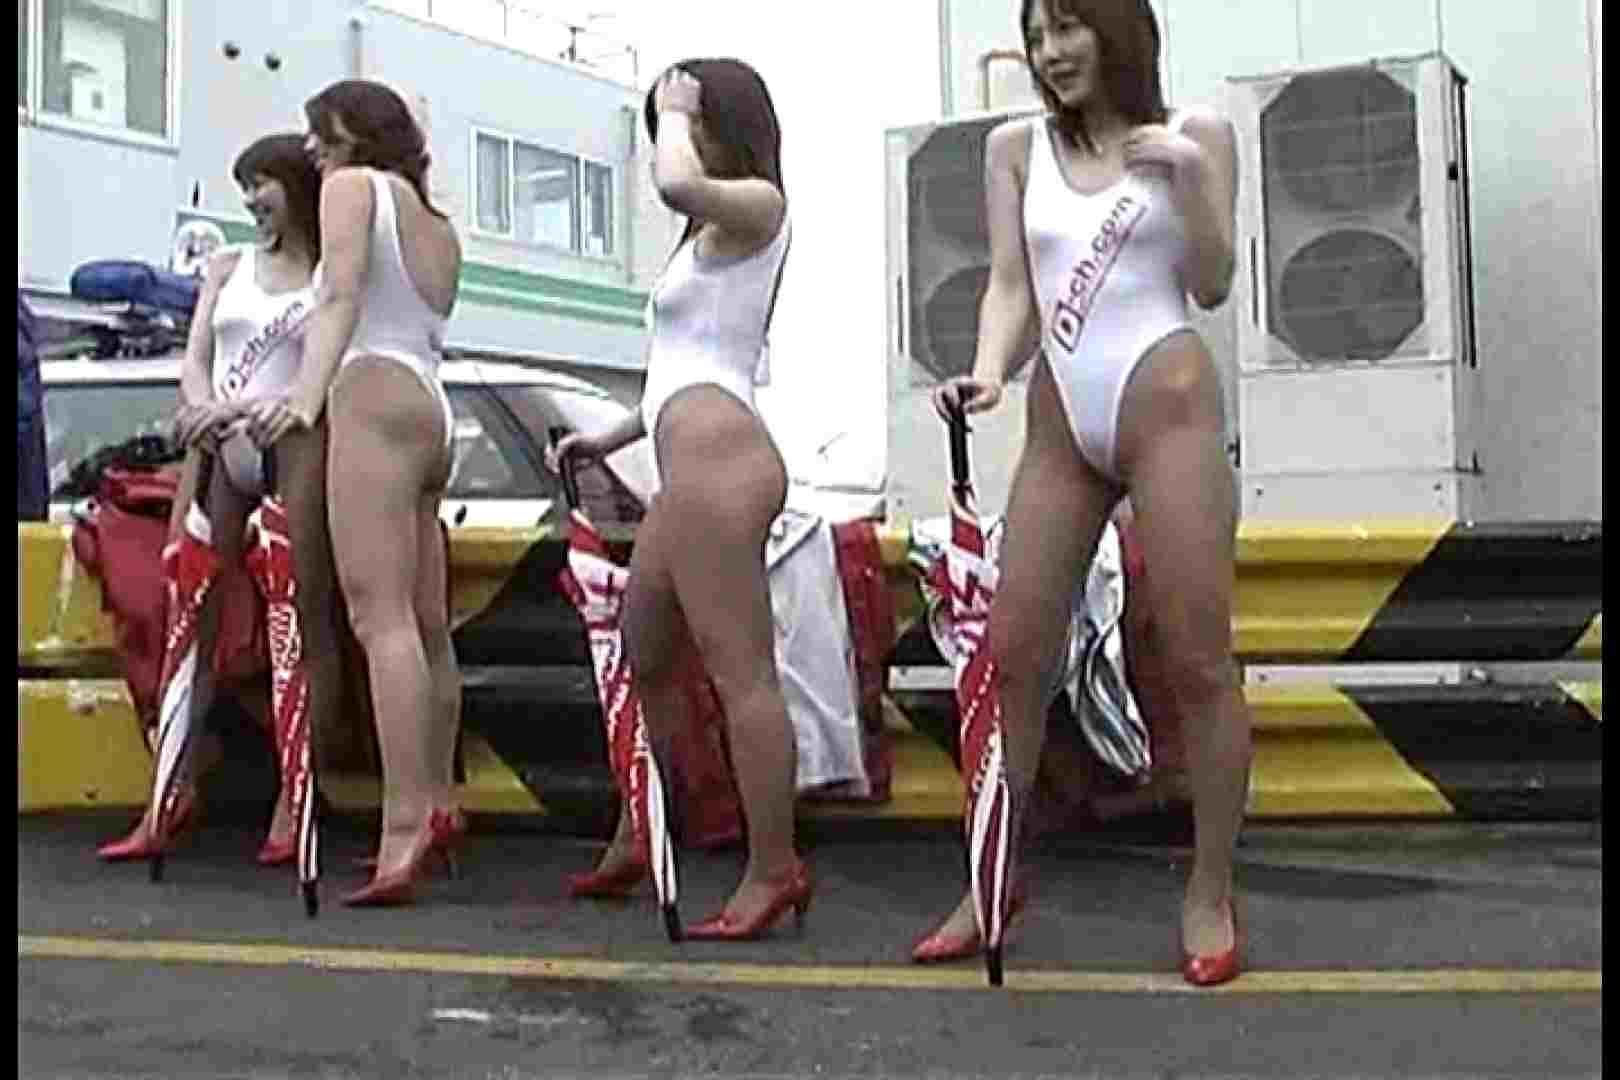 RQカメラ地獄Vol.4 レースクイーンエロ画像  83PICs 28